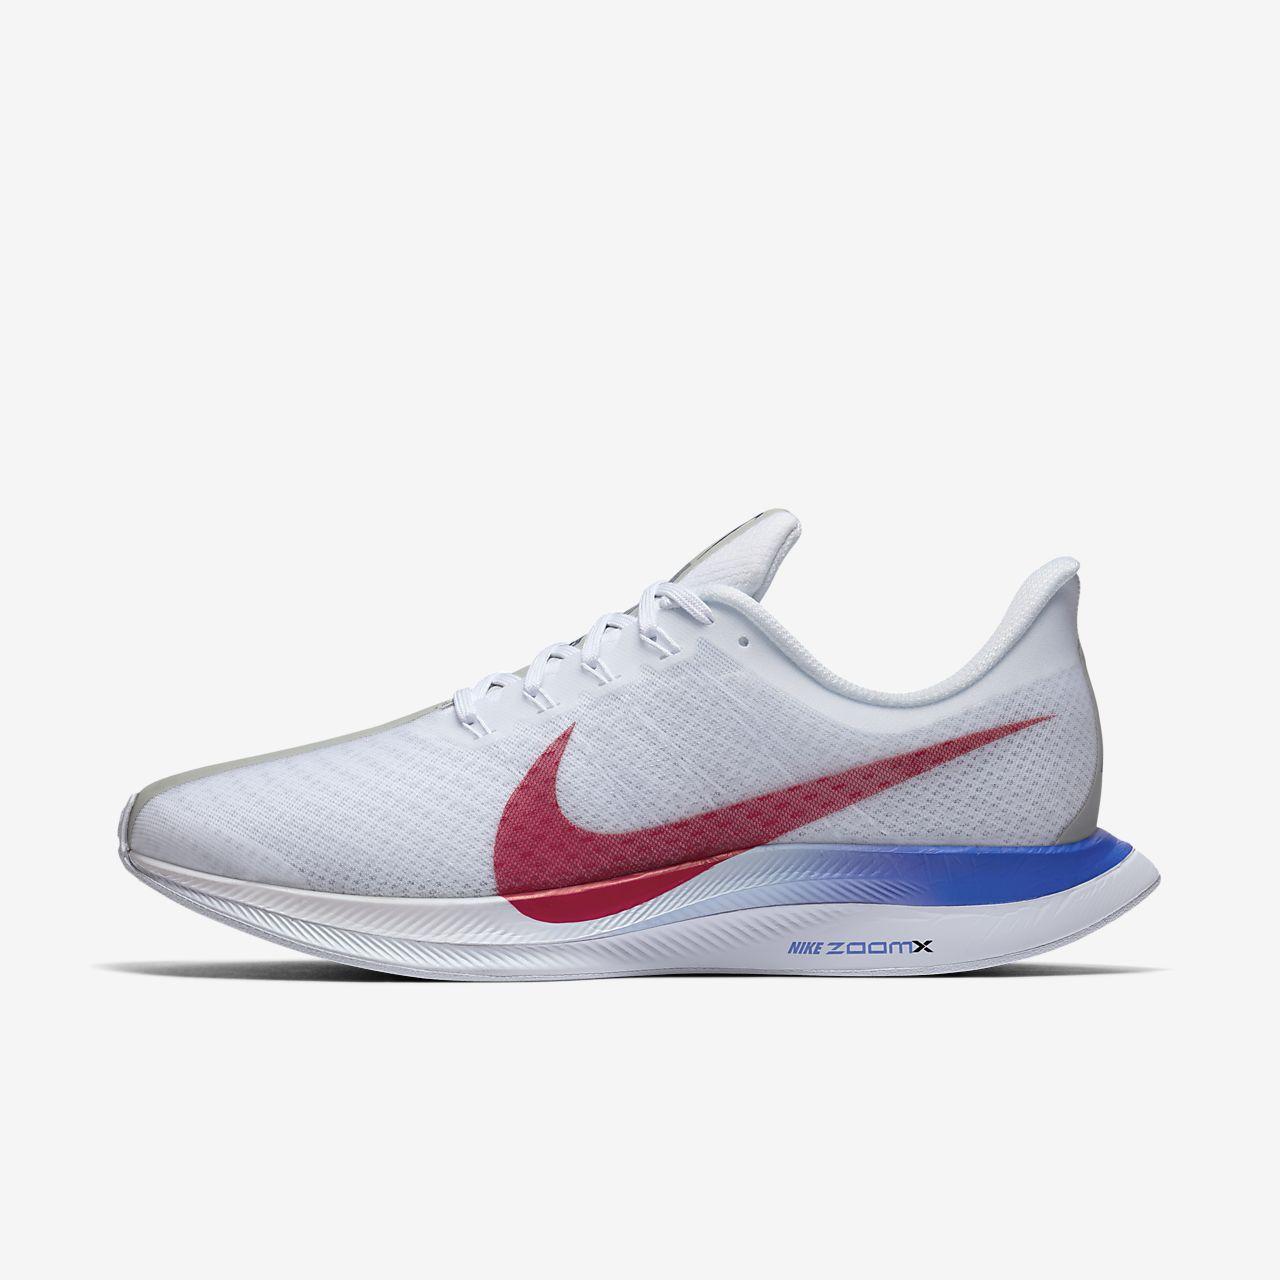 Nike Zoom Pegasus 35 Turbo BRS løpesko til herre